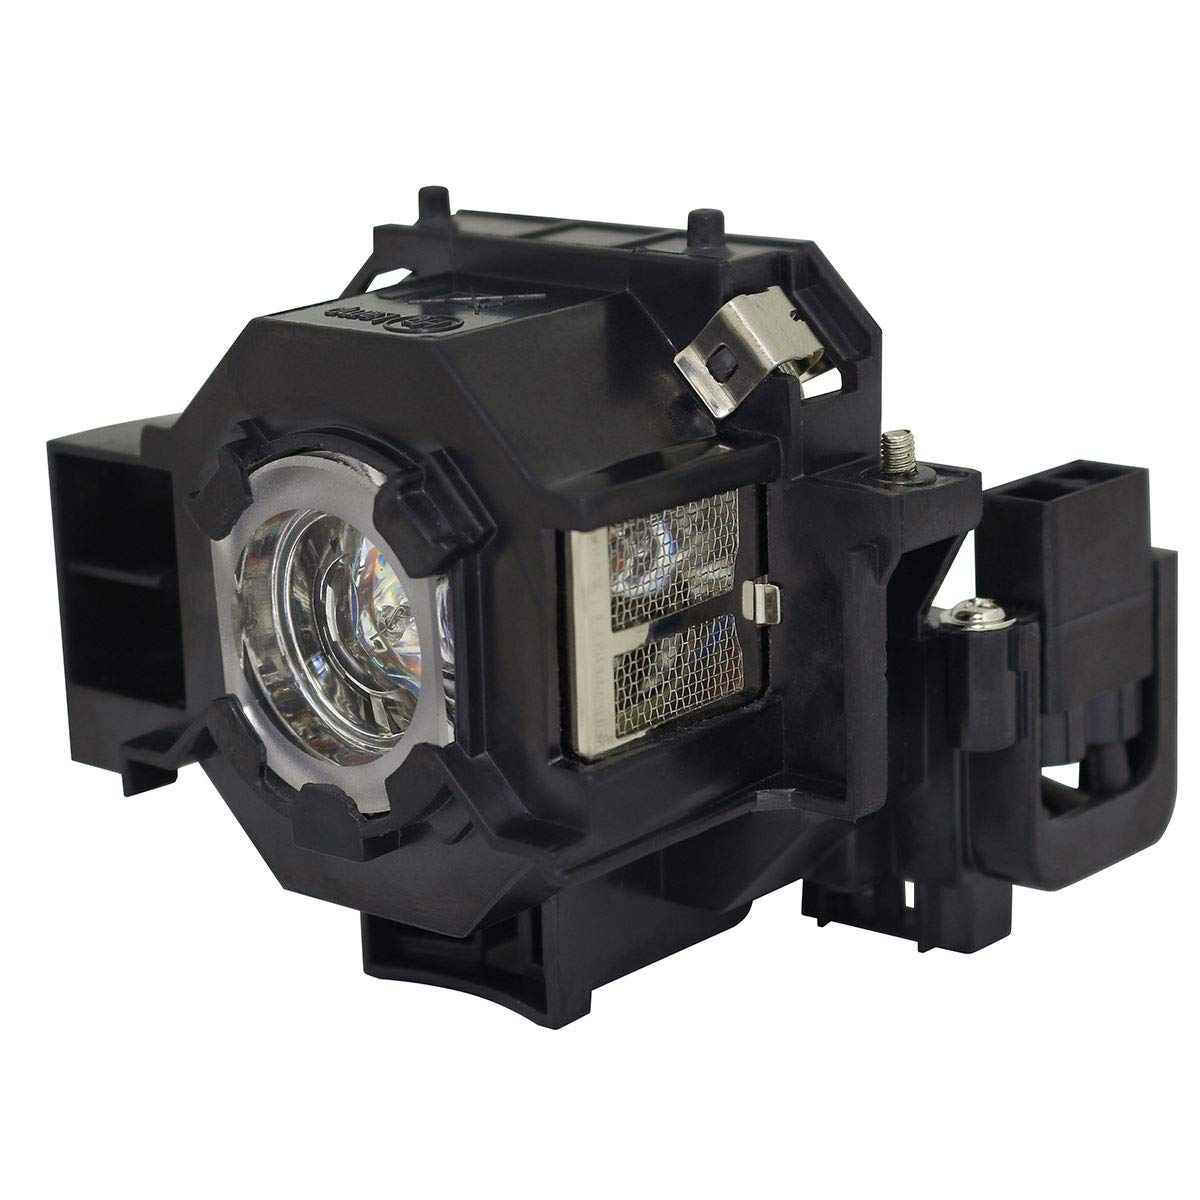 Osram オリジナルプロジェクター交換用ランプ Epson PowerLite 822p用 Platinum (Brighter/Durable) Platinum (Brighter/Durable) Lamp with Housing B07L2B1N62